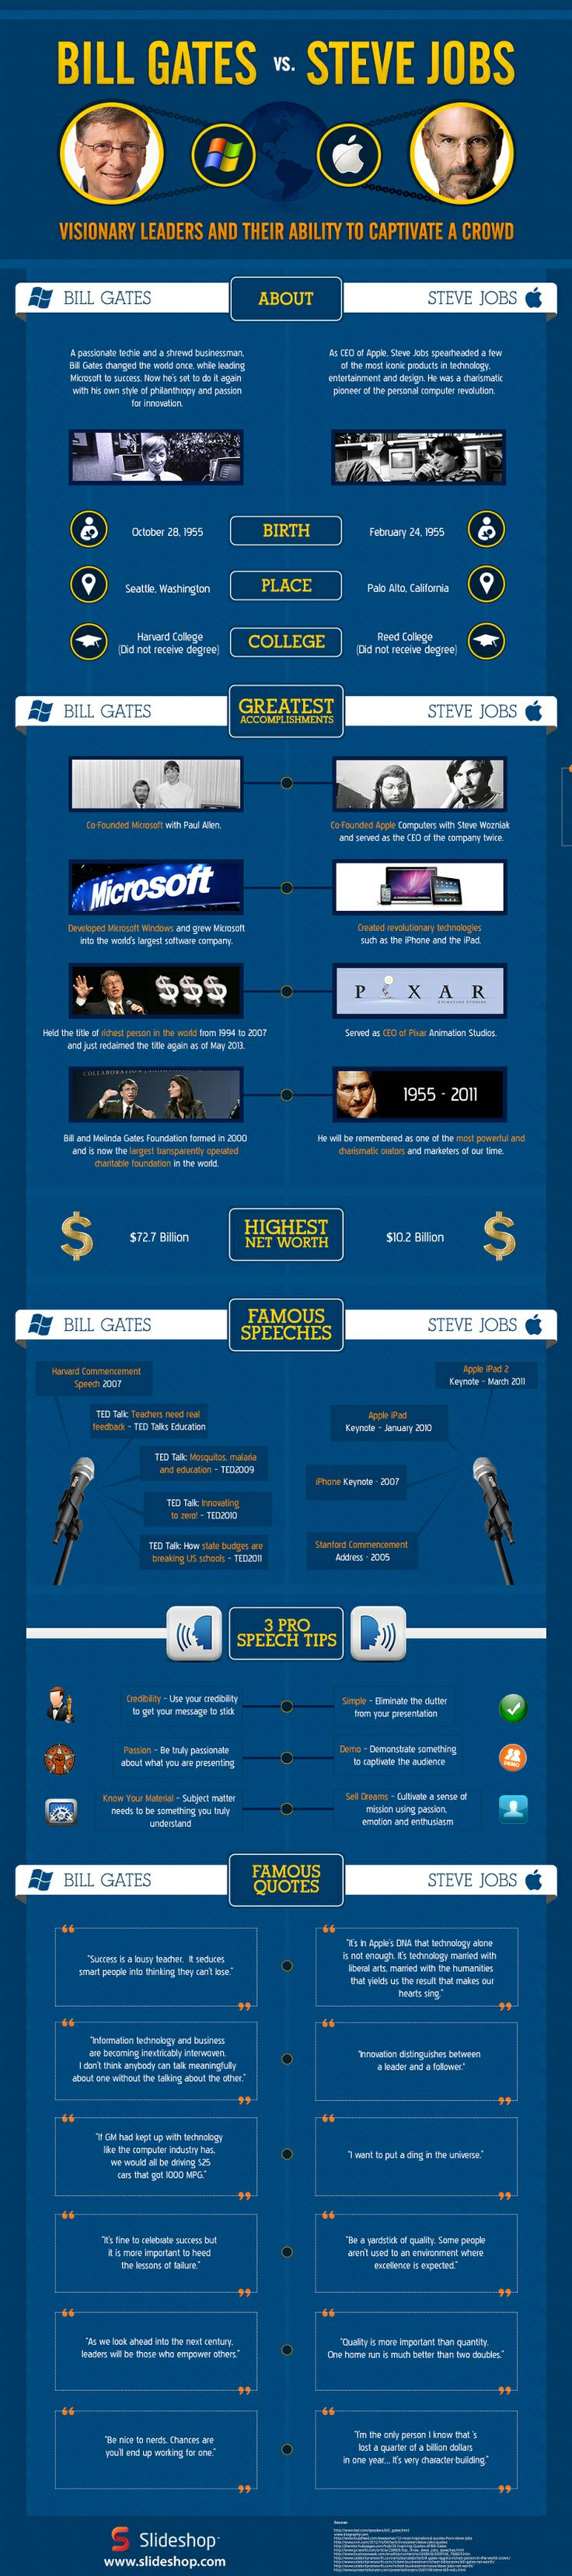 Infographic - Bill Gates - Steve Jobs